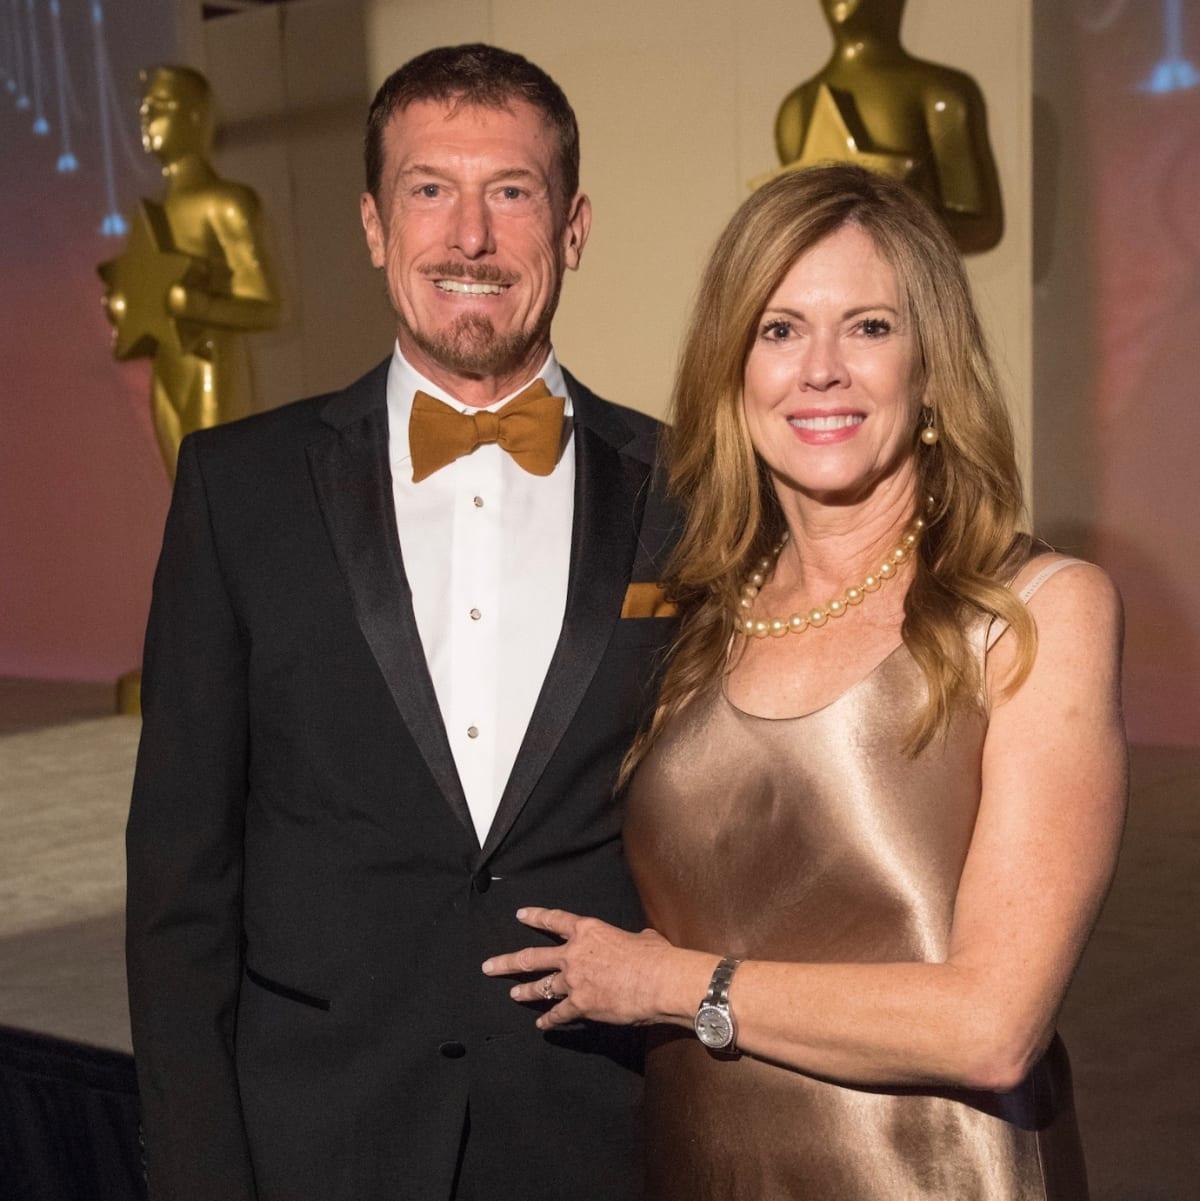 Gloria and Frank Meszaros/CAP Gala